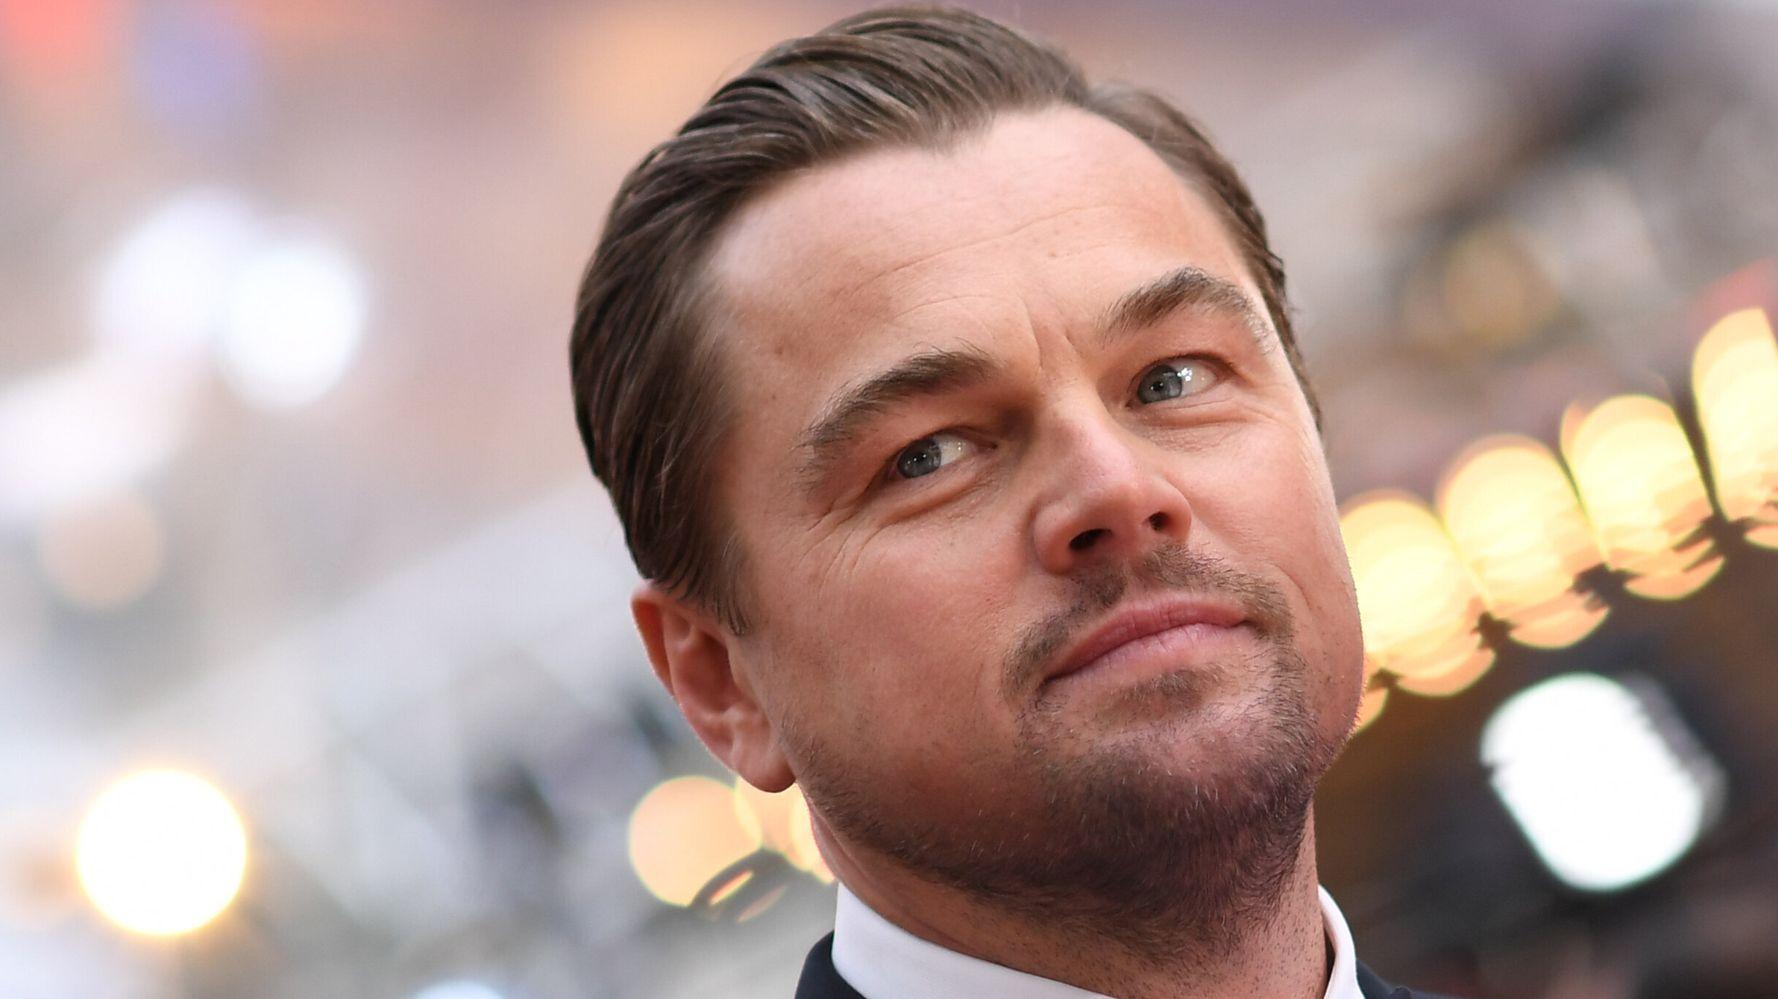 NY Post's Baffling Take On Leonardo DiCaprio Becomes Twitter's Hottest New Meme